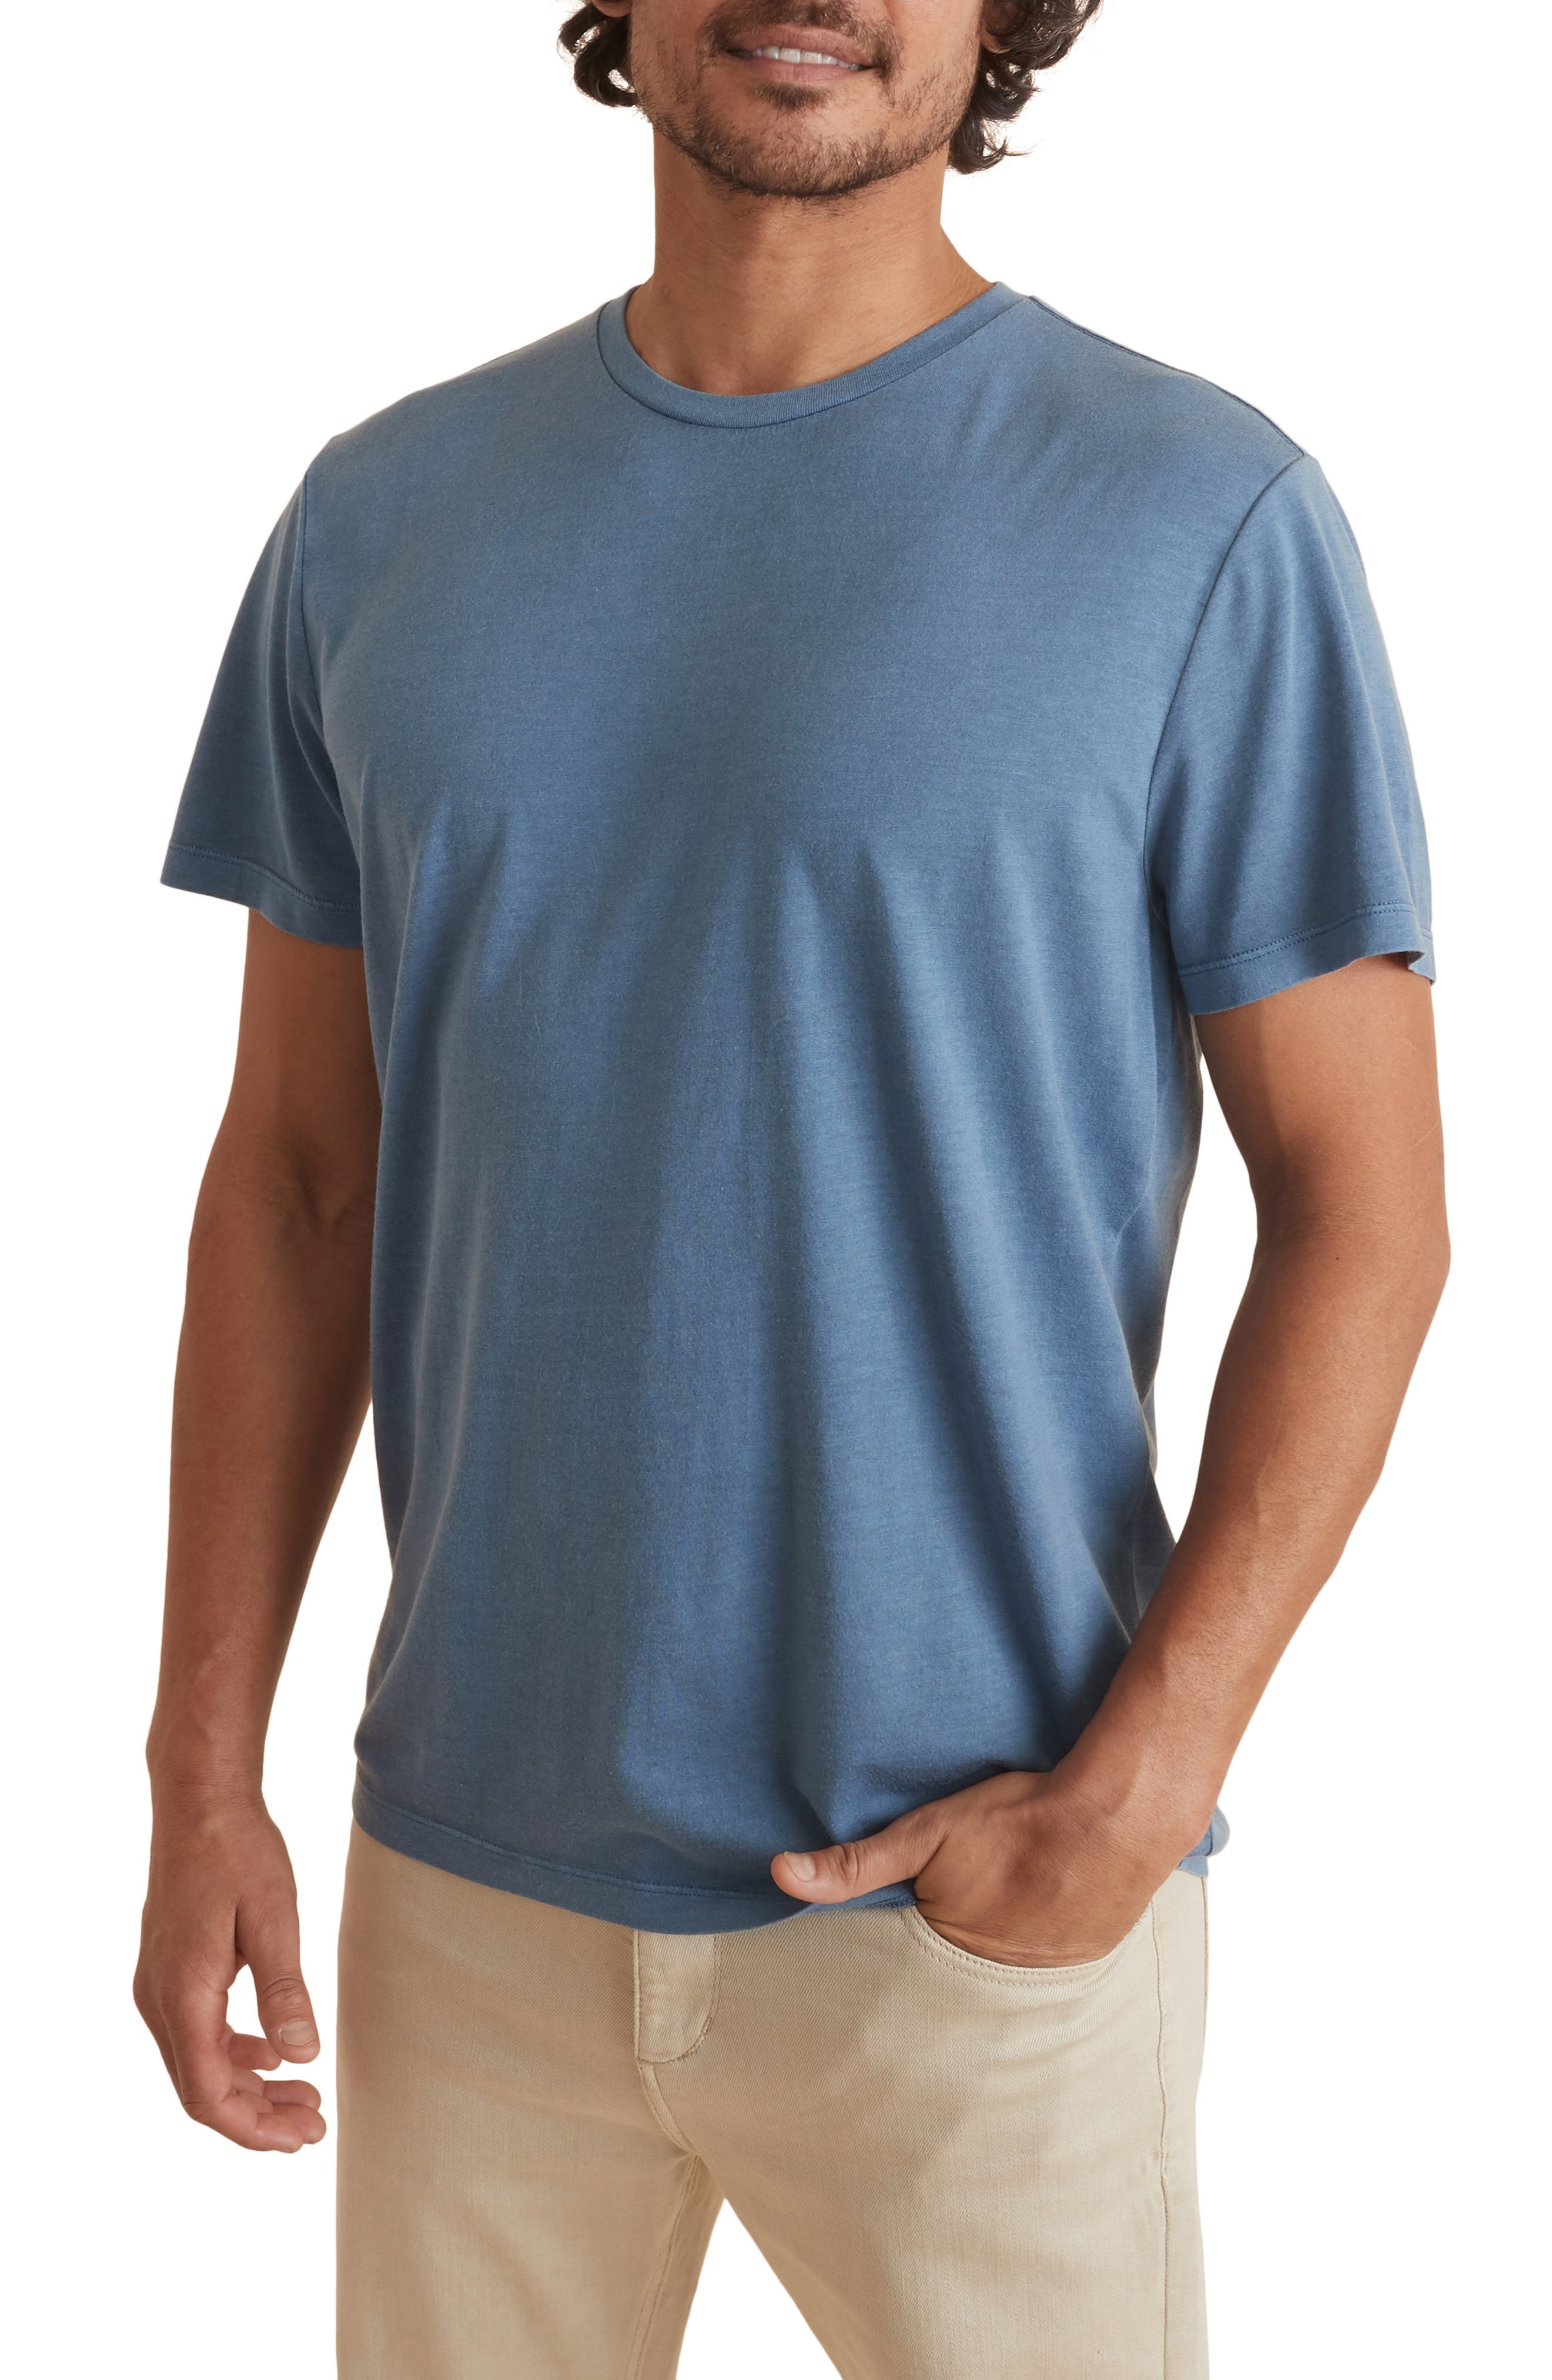 Signature Slub T-Shirt